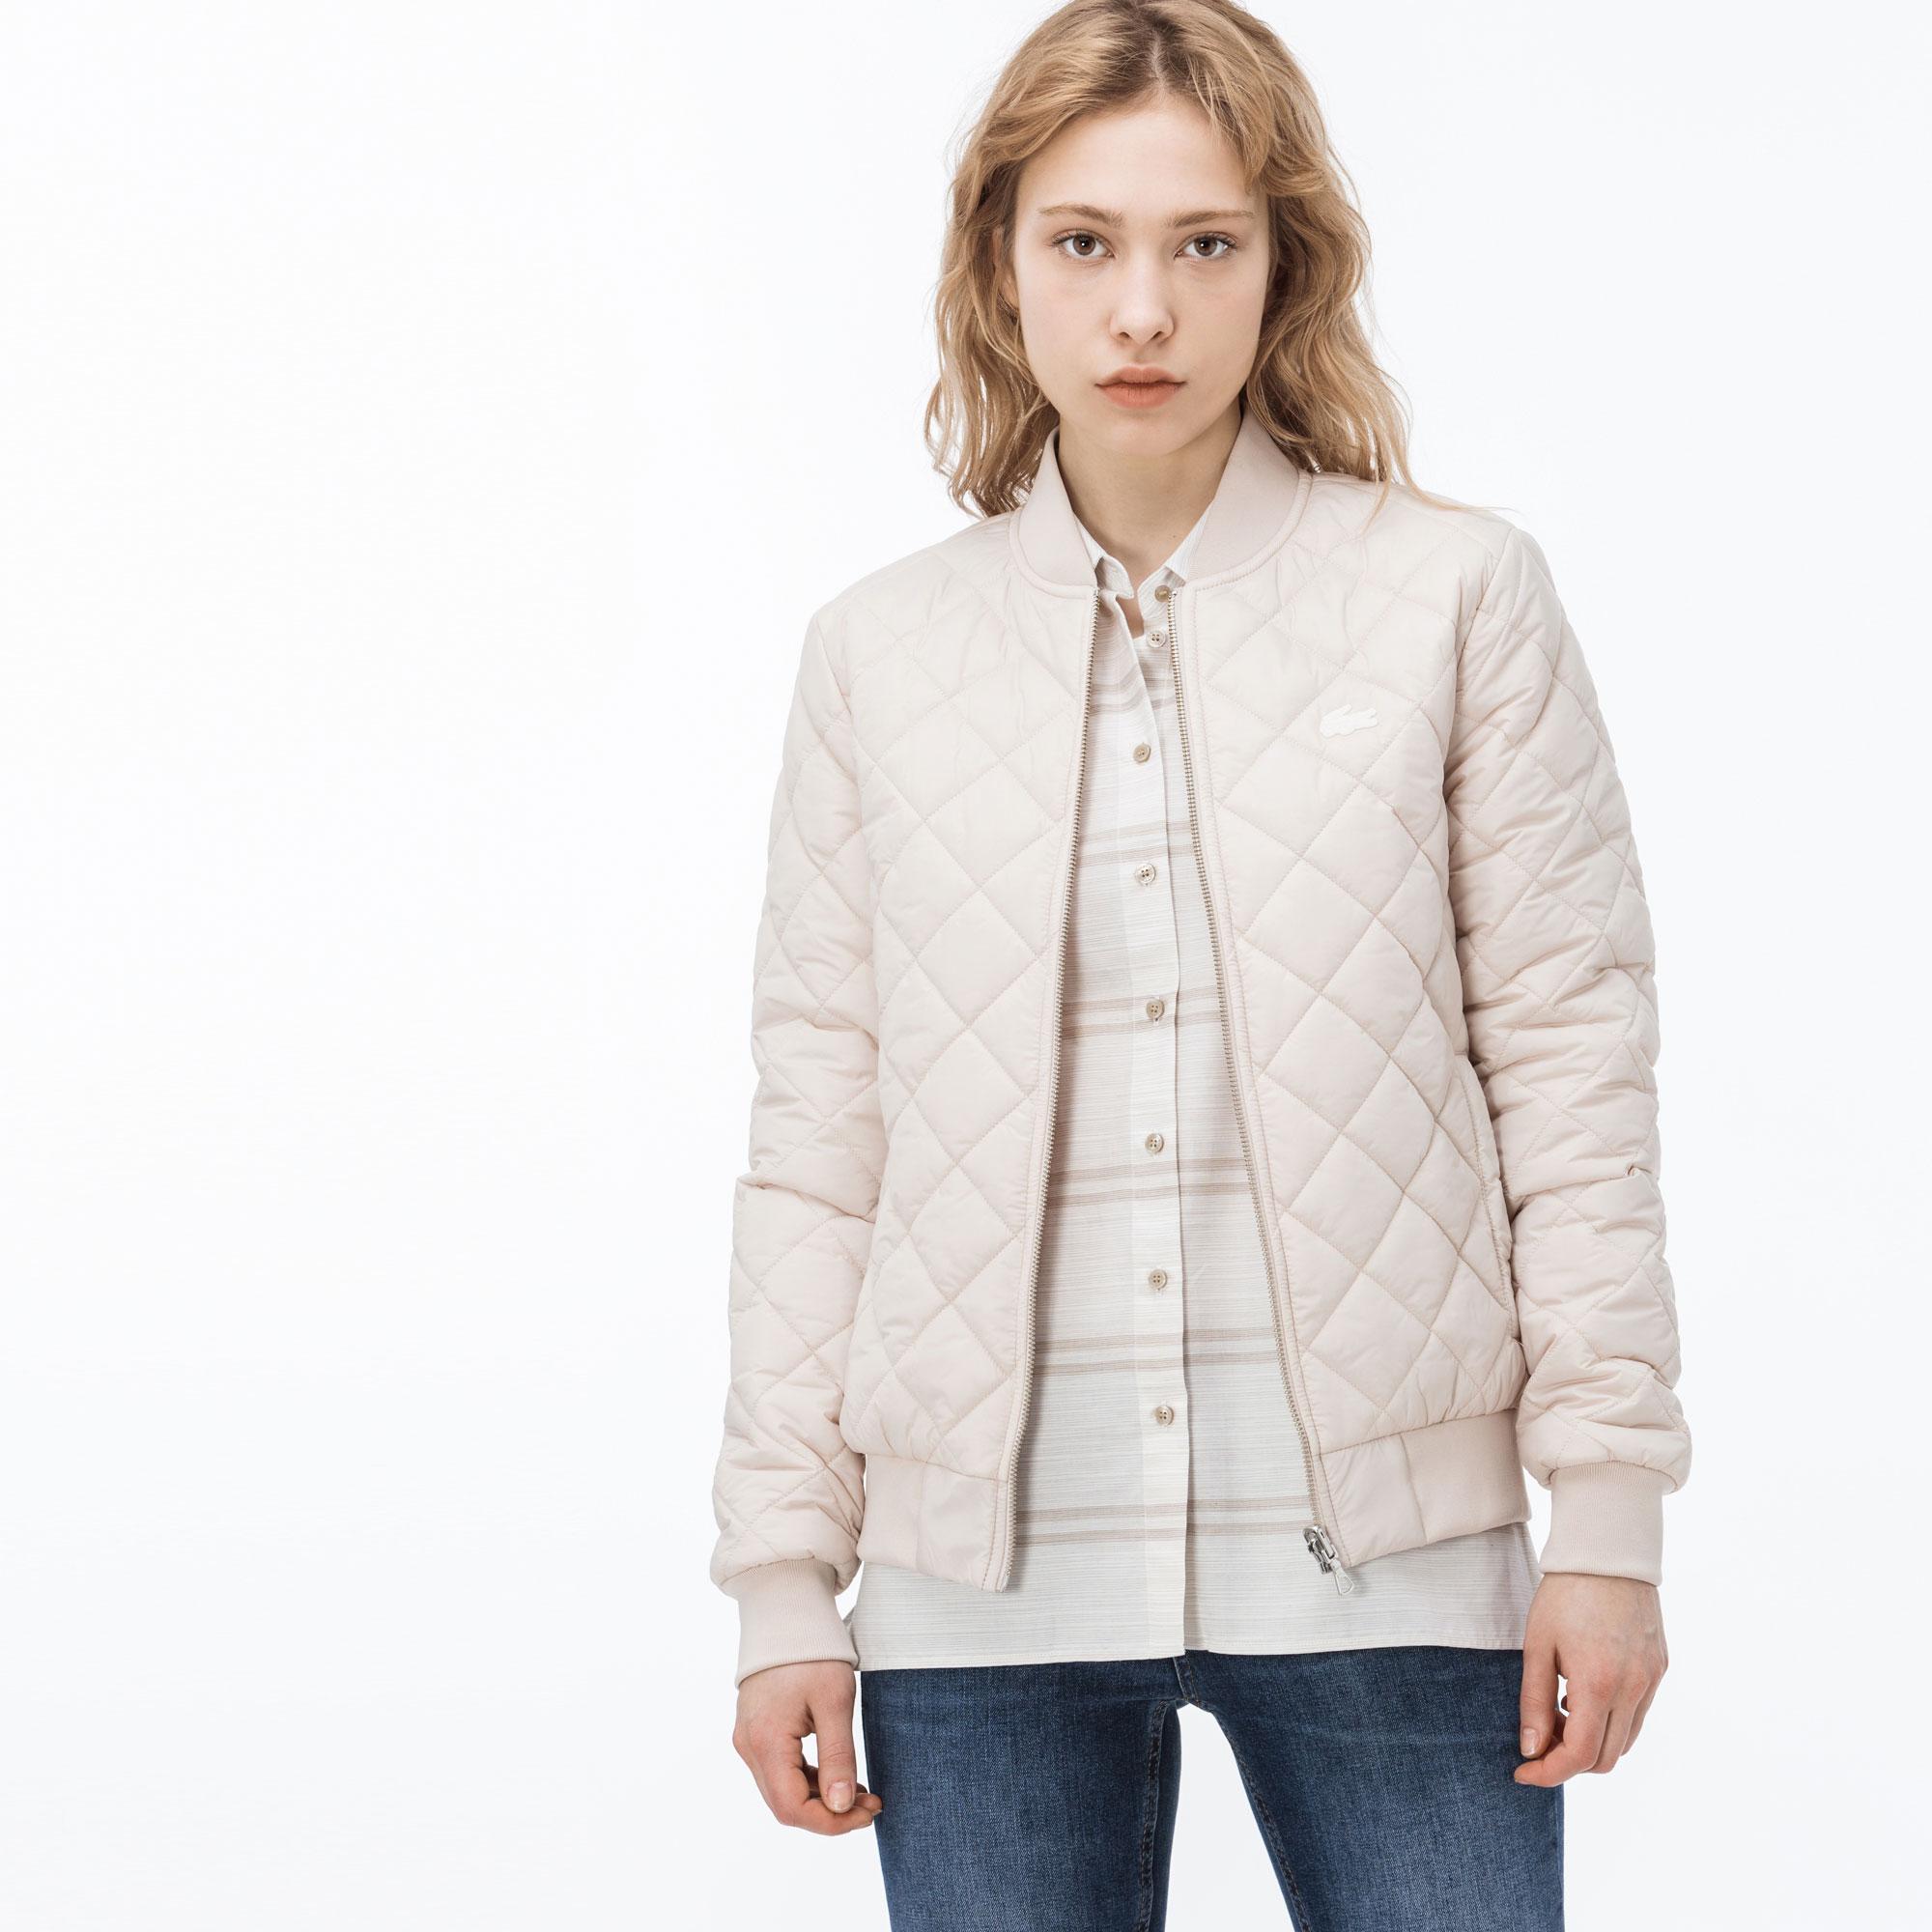 Купить Куртка Lacoste, розовый, BF0905